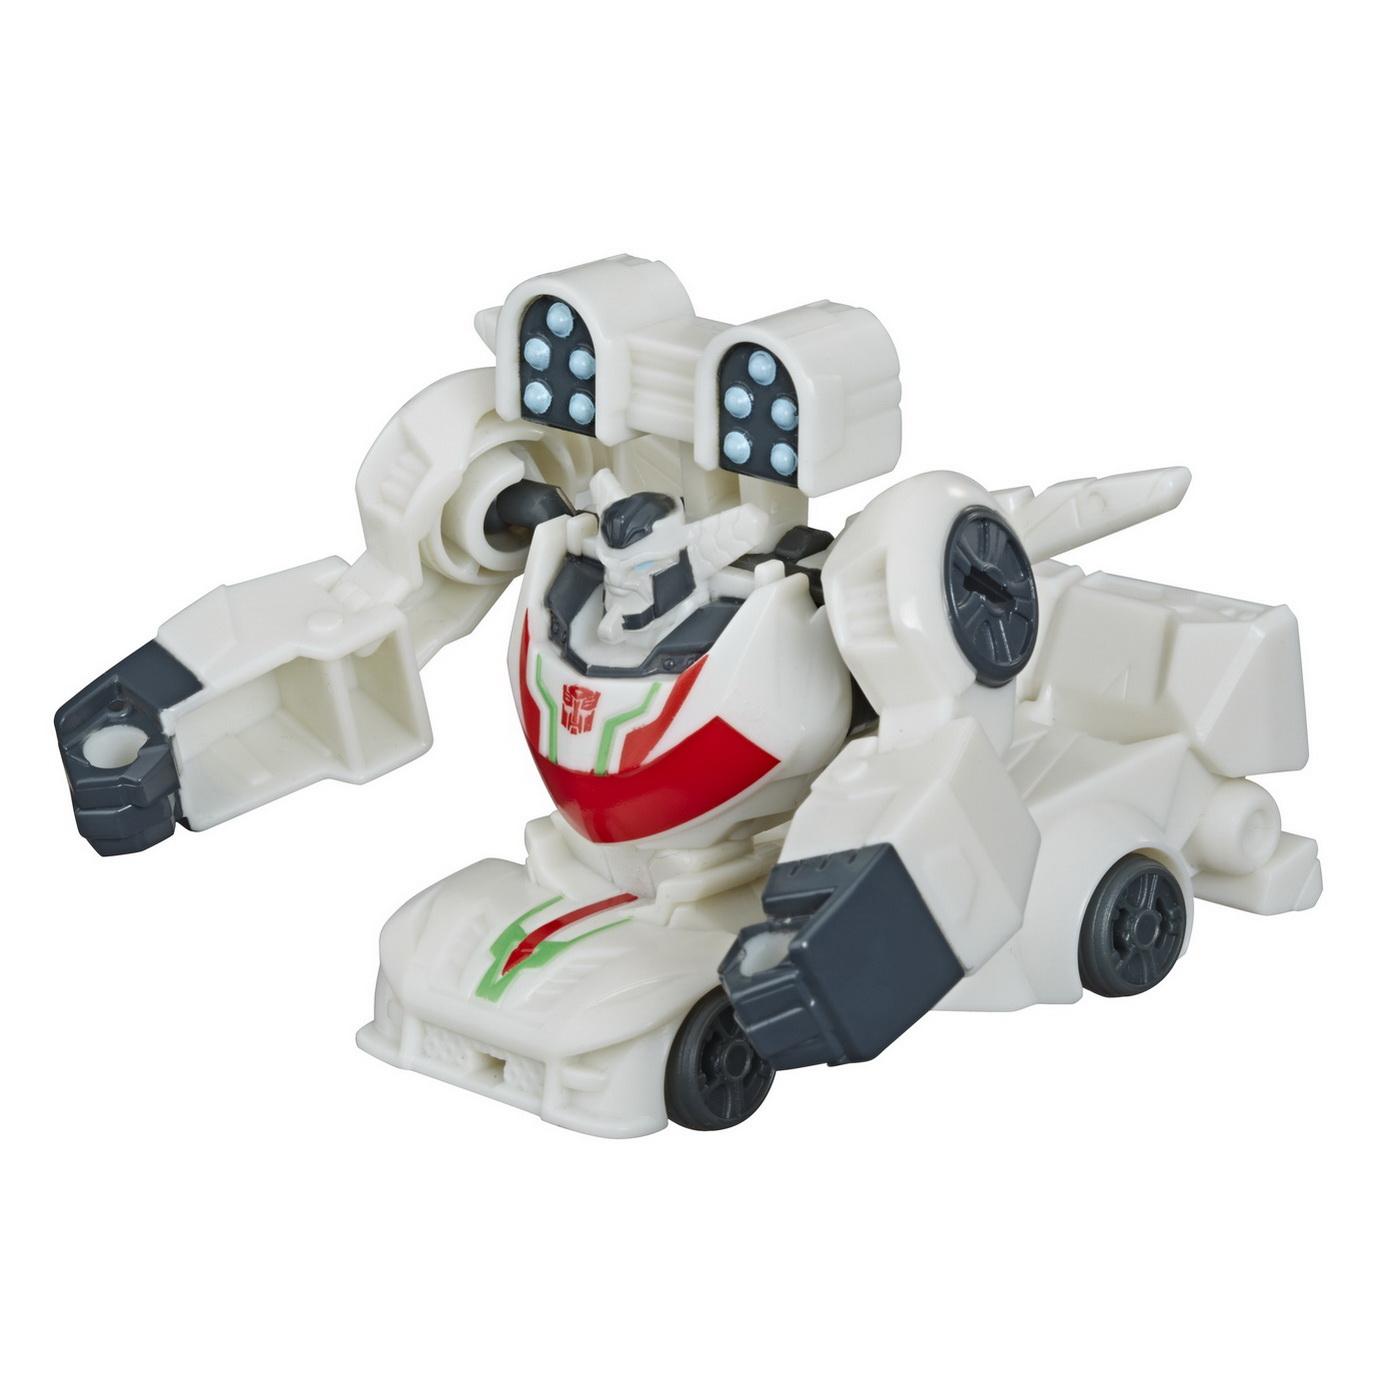 Tranformers Robot Wheeljack seria Gravity Cannon